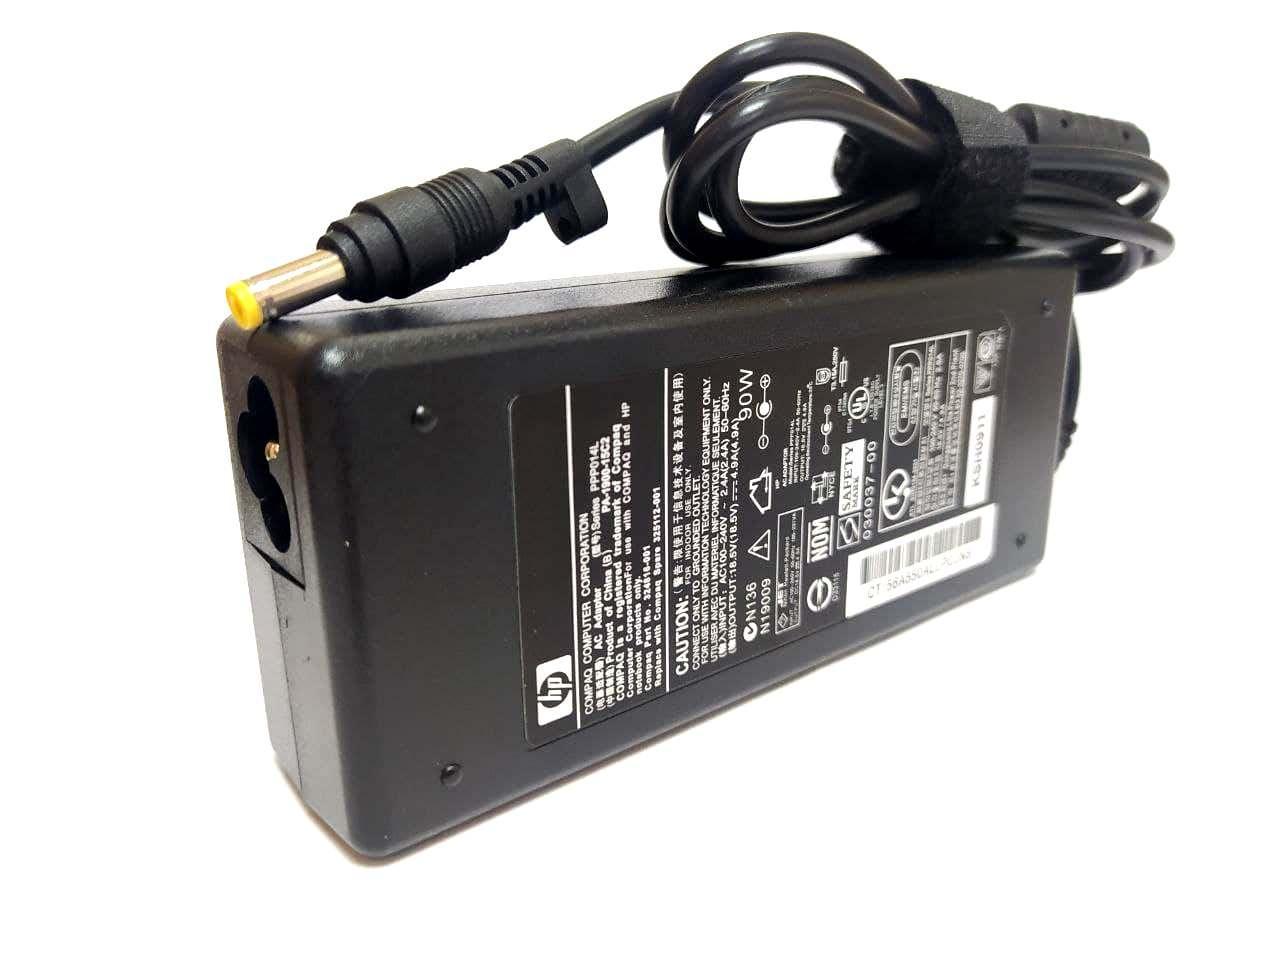 Блок питания для ноутбука HP Pavilion dv2500 18.5V 4.9A 4.8*1.7mm 90W